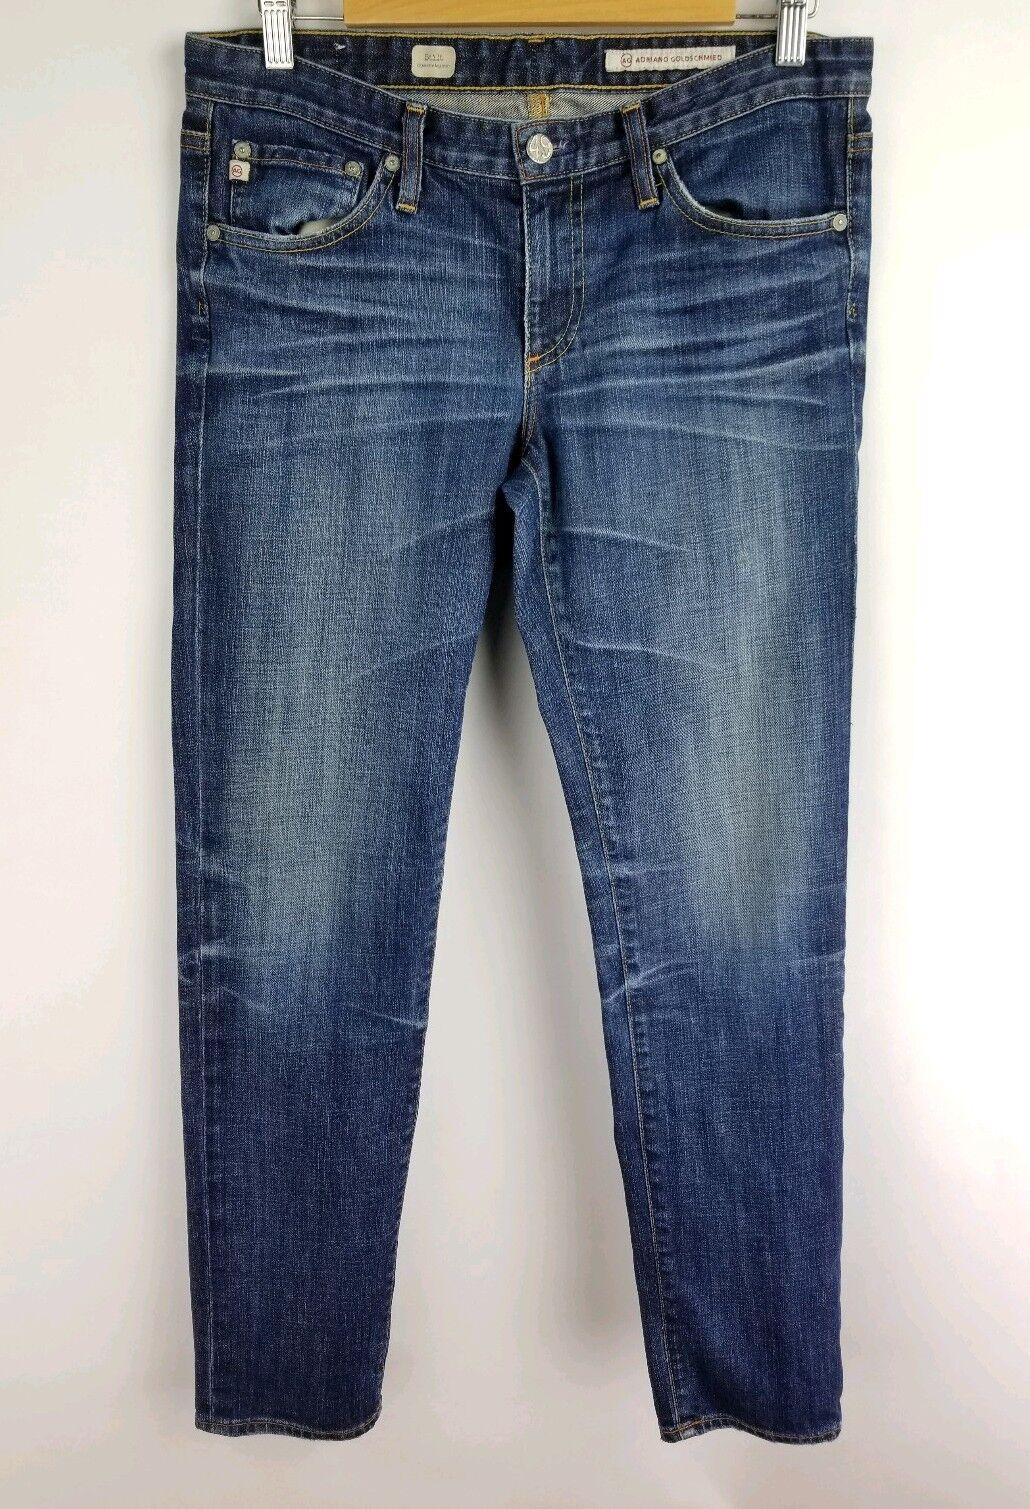 AG Adriano goldschmied Jeans Size 29 R Womens Stilt Cigarette Leg Medium Wash